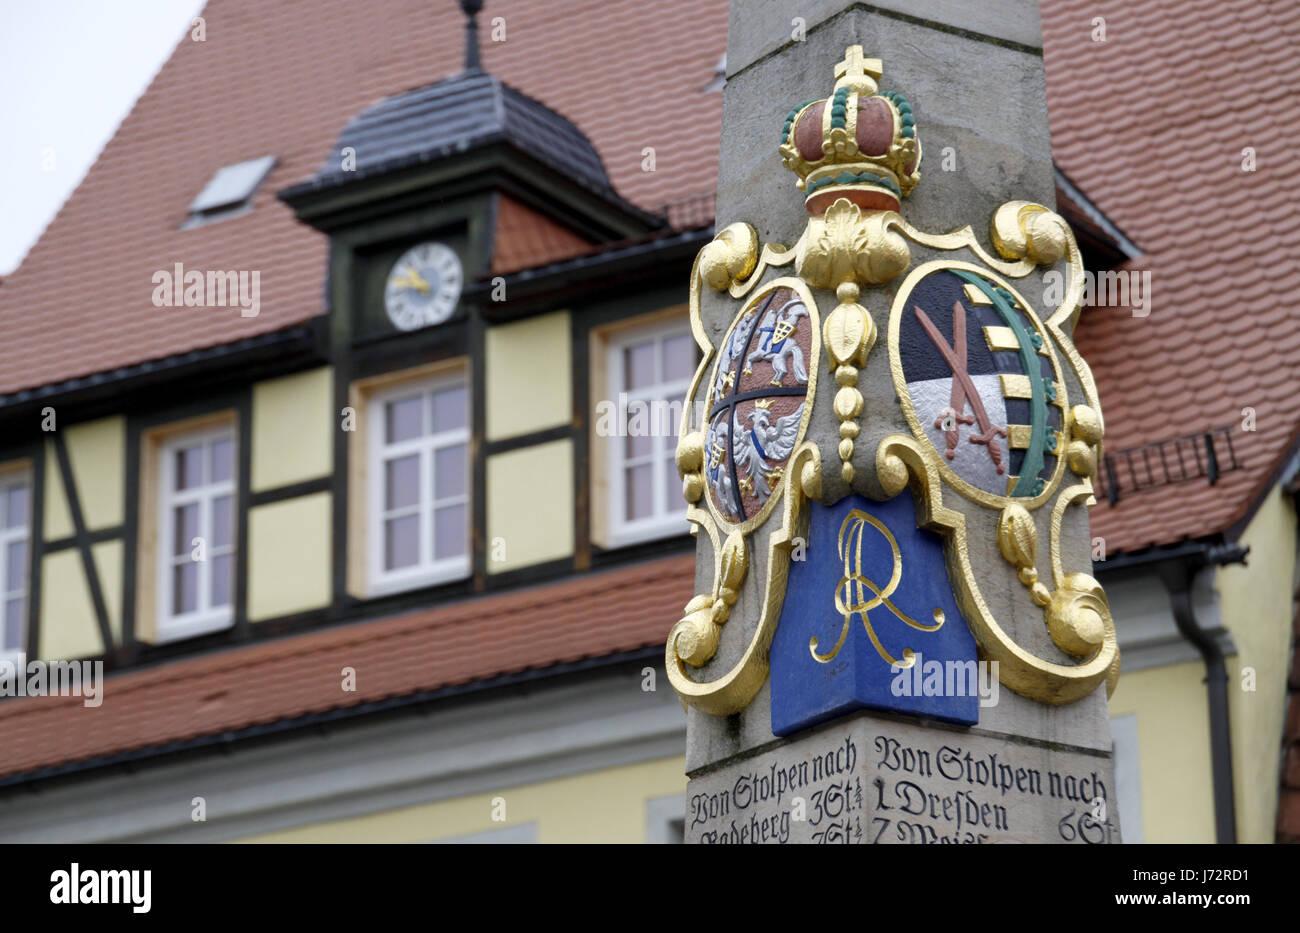 pillar signpost distances weekly market marketplace flea market switzerland - Stock Image